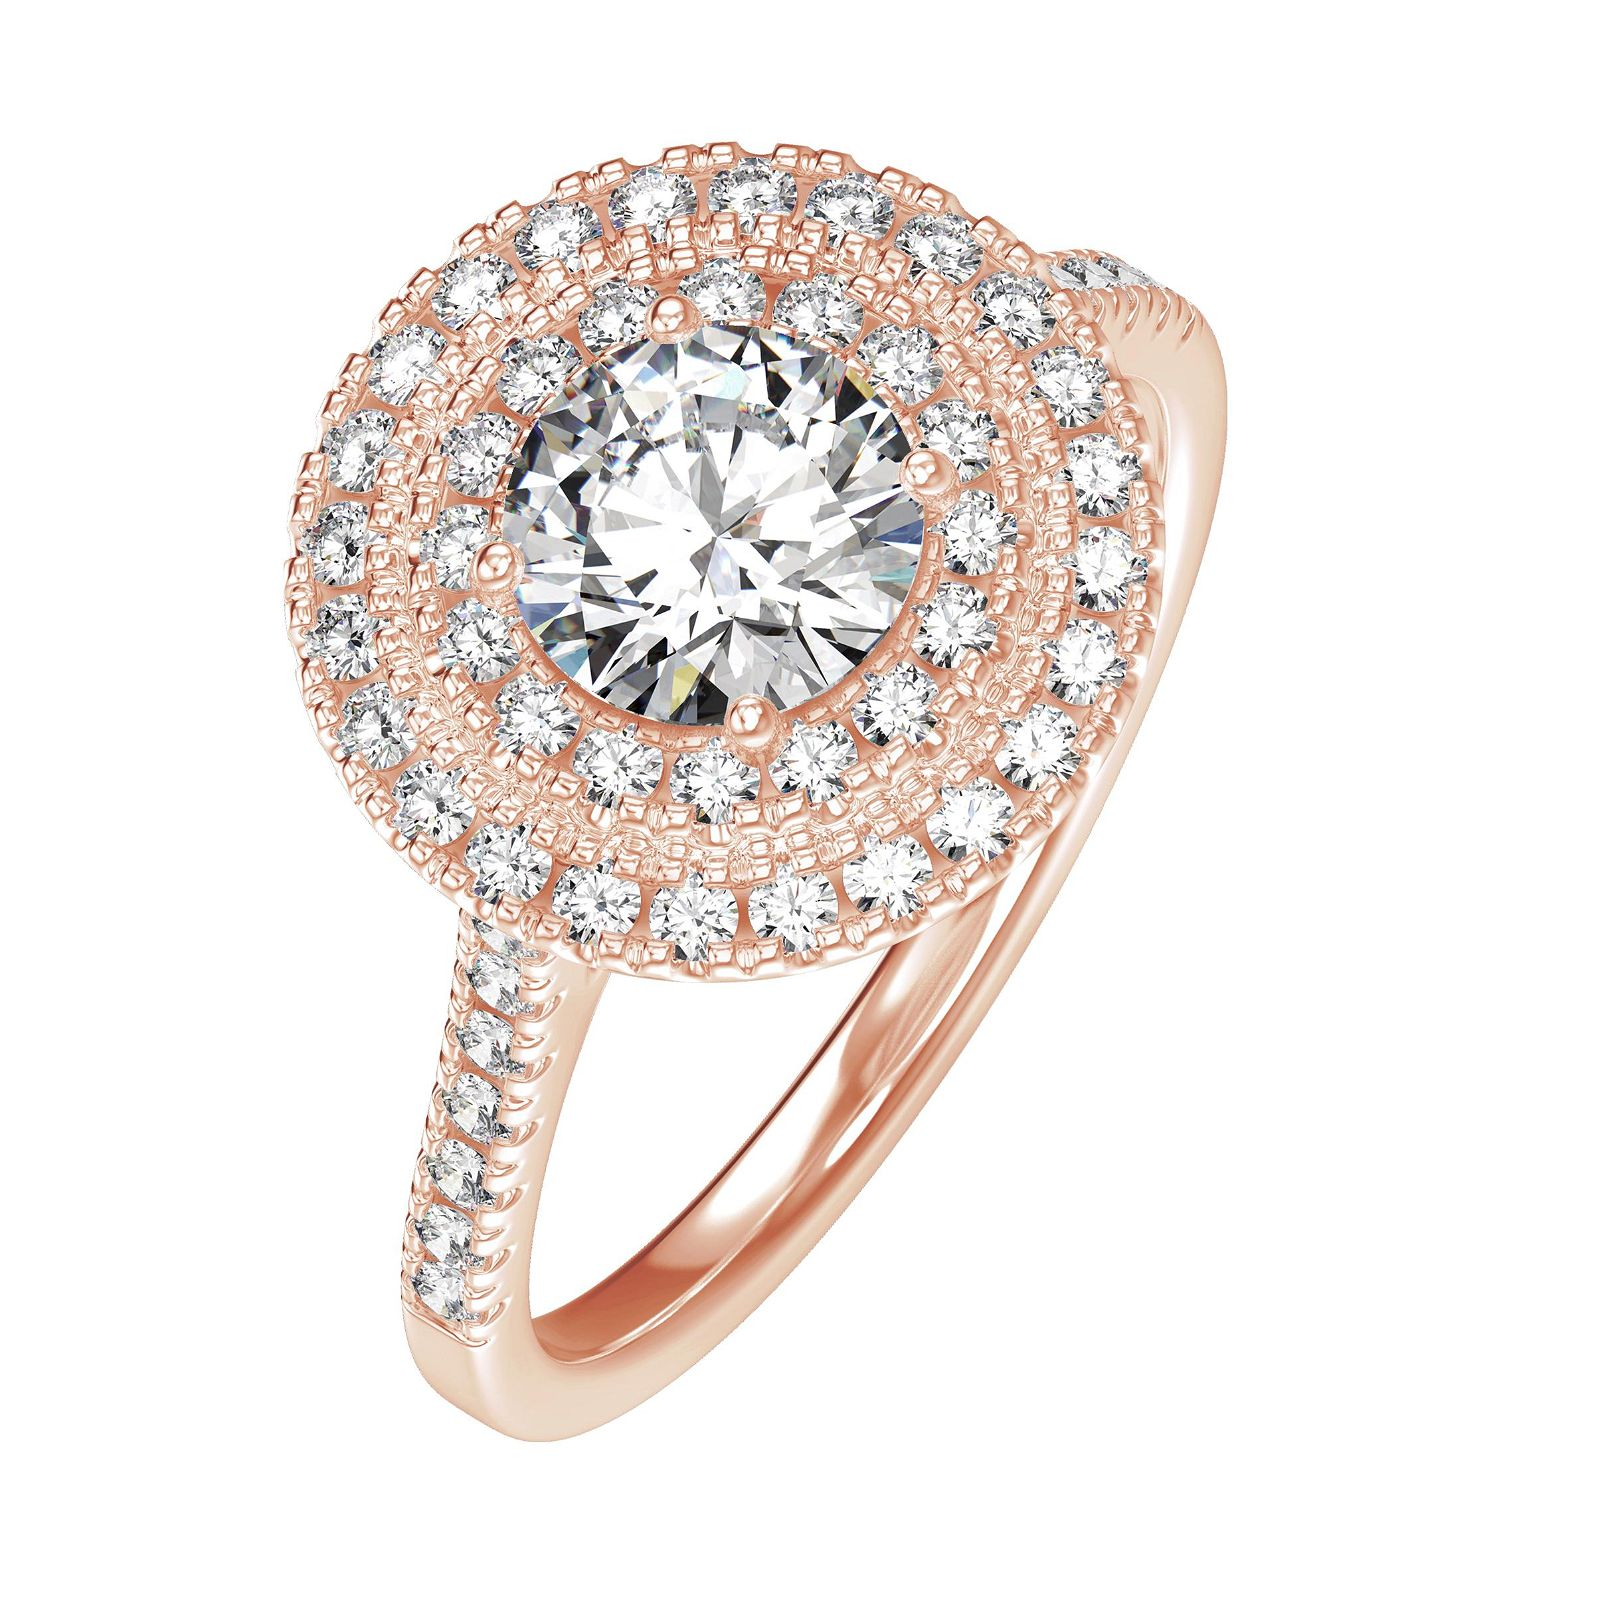 154 Carat Double Halo 14K Rose Gold Engagement Ring